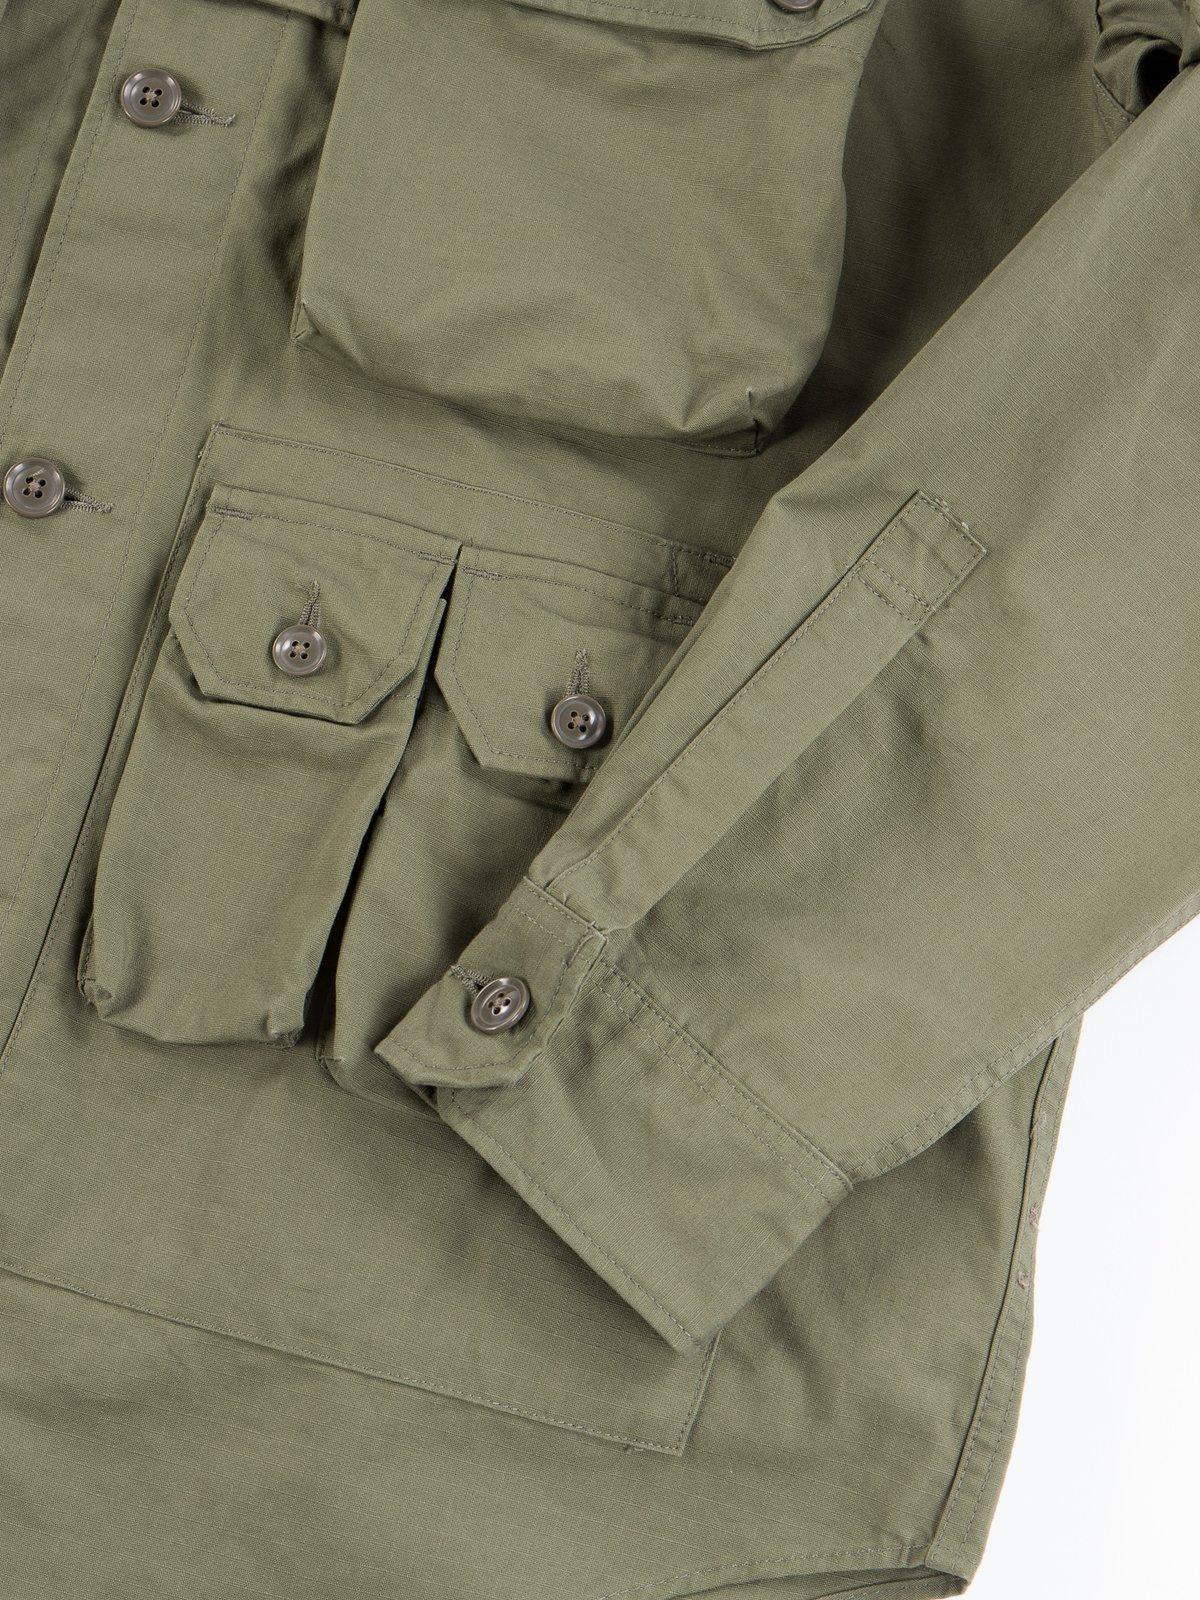 Olive Cotton Ripstop Explorer Shirt Jacket - Image 6